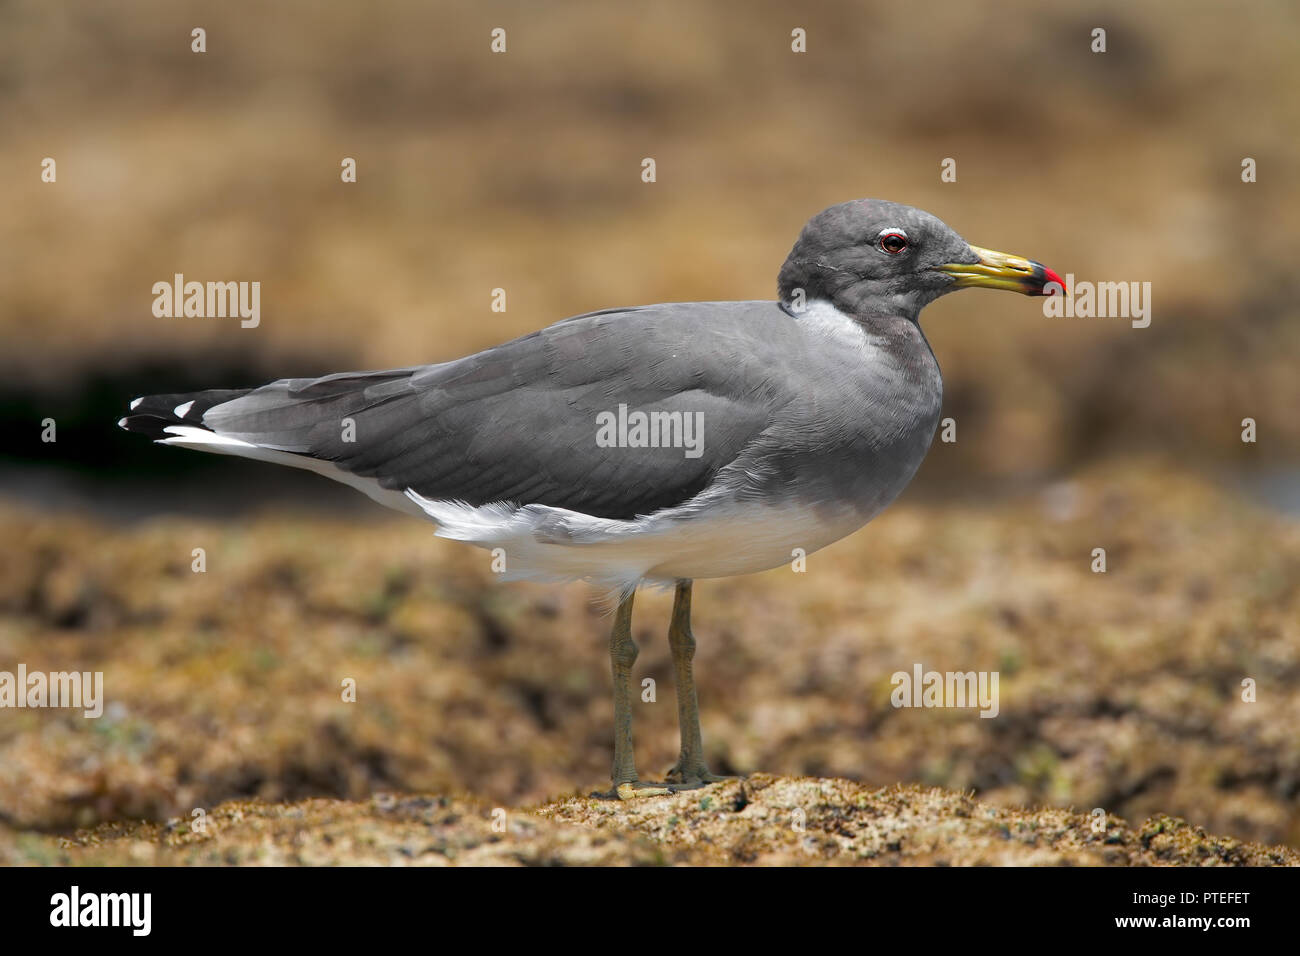 Hemprich's gull - Stock Image